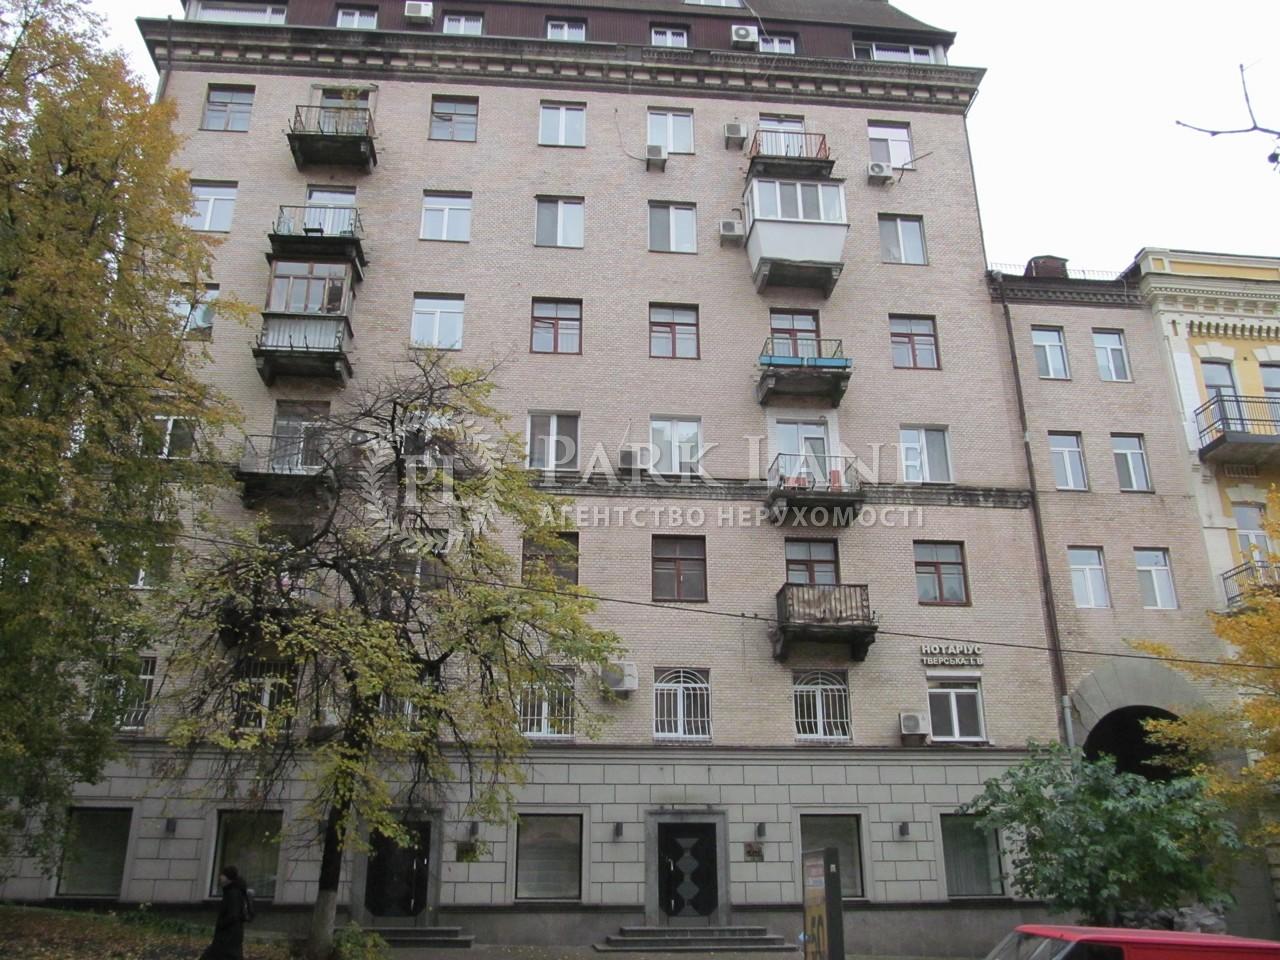 Квартира K-31667, Хмельницкого Богдана, 49, Киев - Фото 2